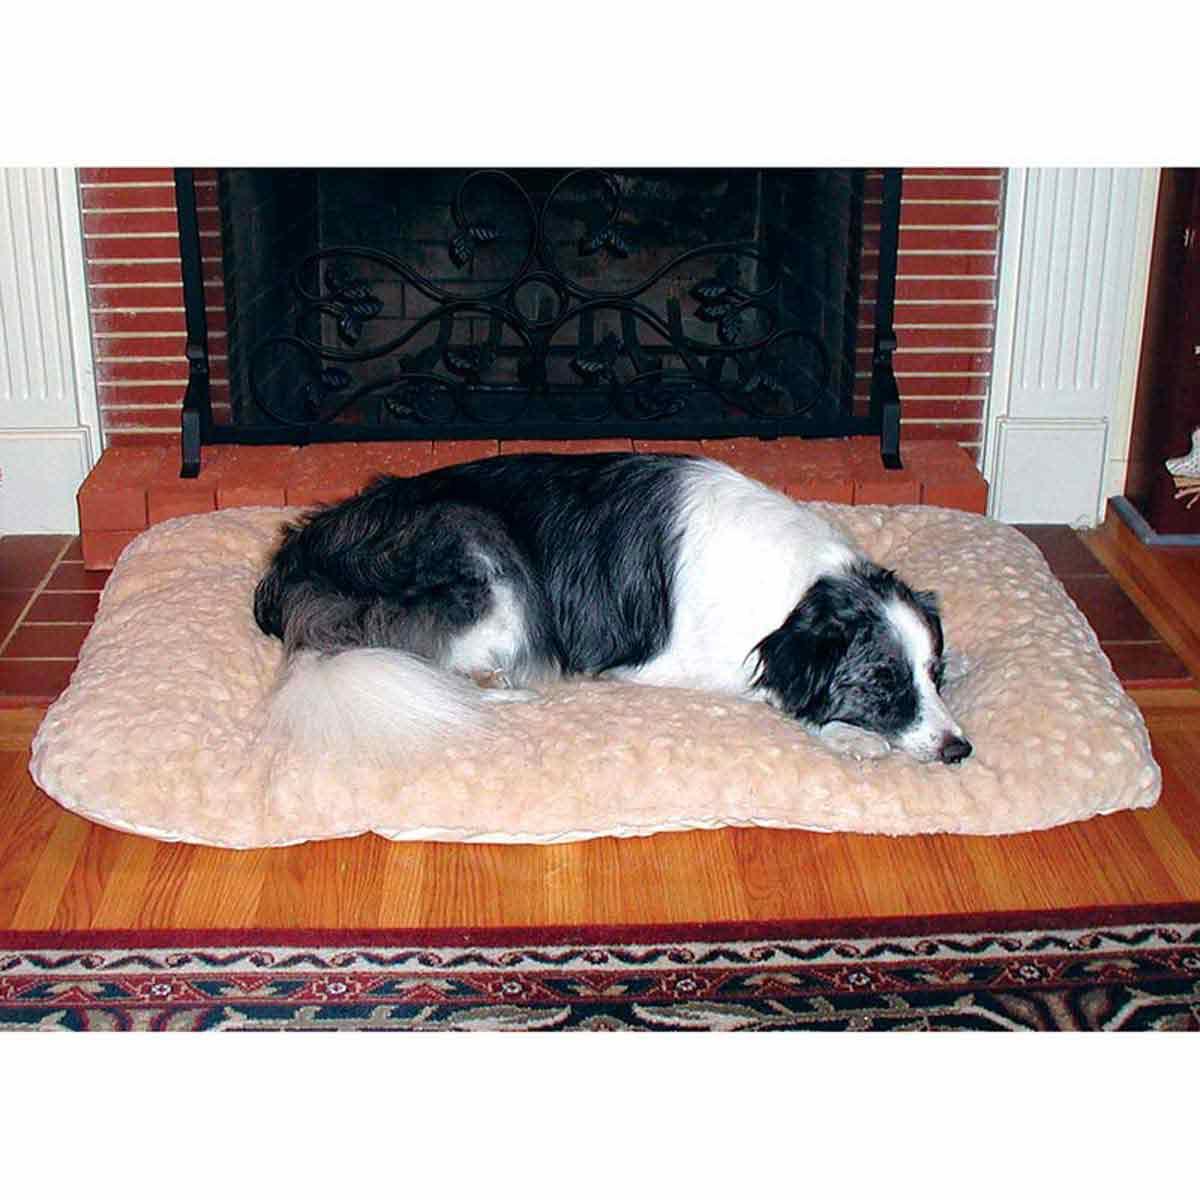 Doggy Sleeping on Snoozzy Comforter 17.5 X 11.5 Natural